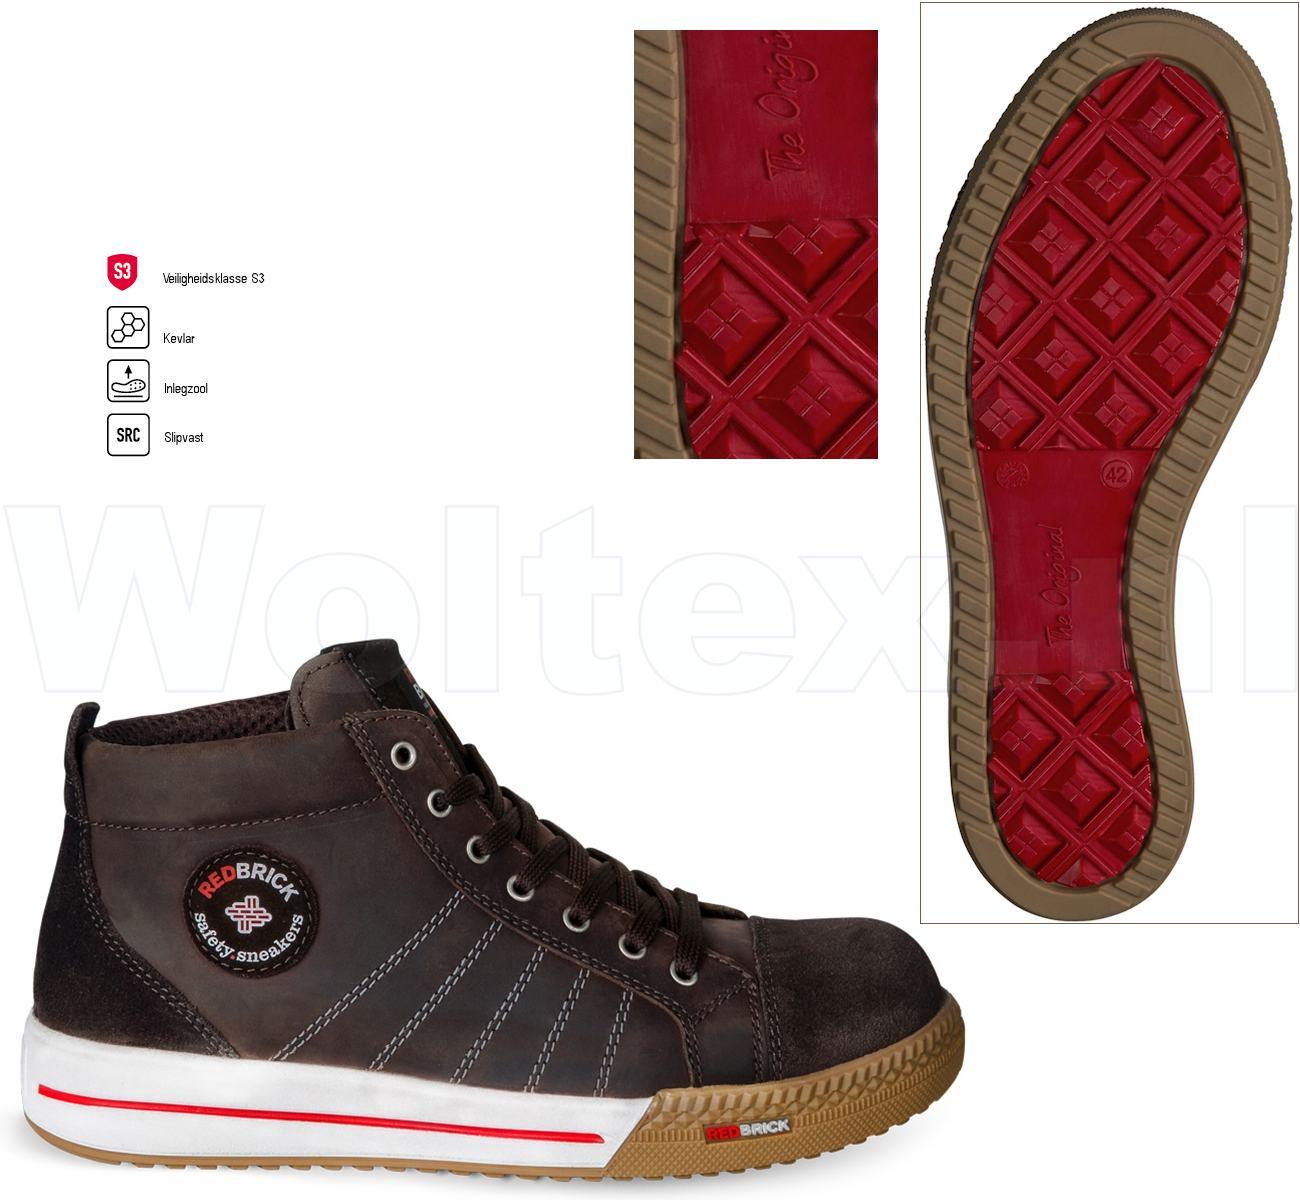 Redbrick Werkschoenen.Redbrick Safety Sneakers Originals S3 Werkschoenen Smaragd Bruin 42